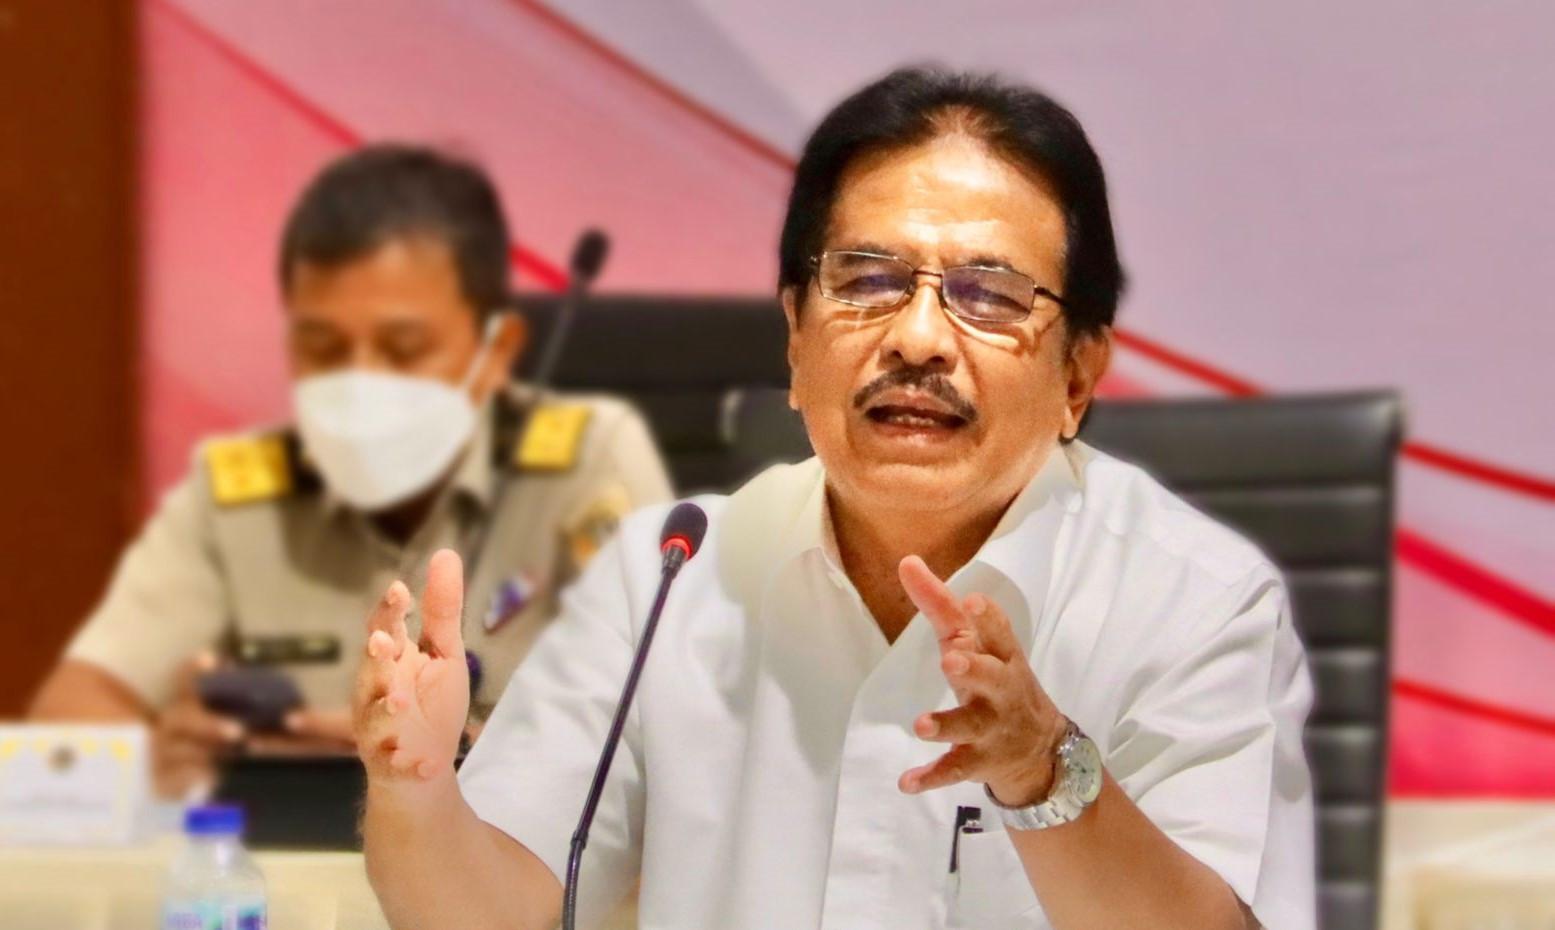 Terbukti Menyimpang, 125 Pegawai Kementerian ATR/BPN Dihukum - JPNN.com